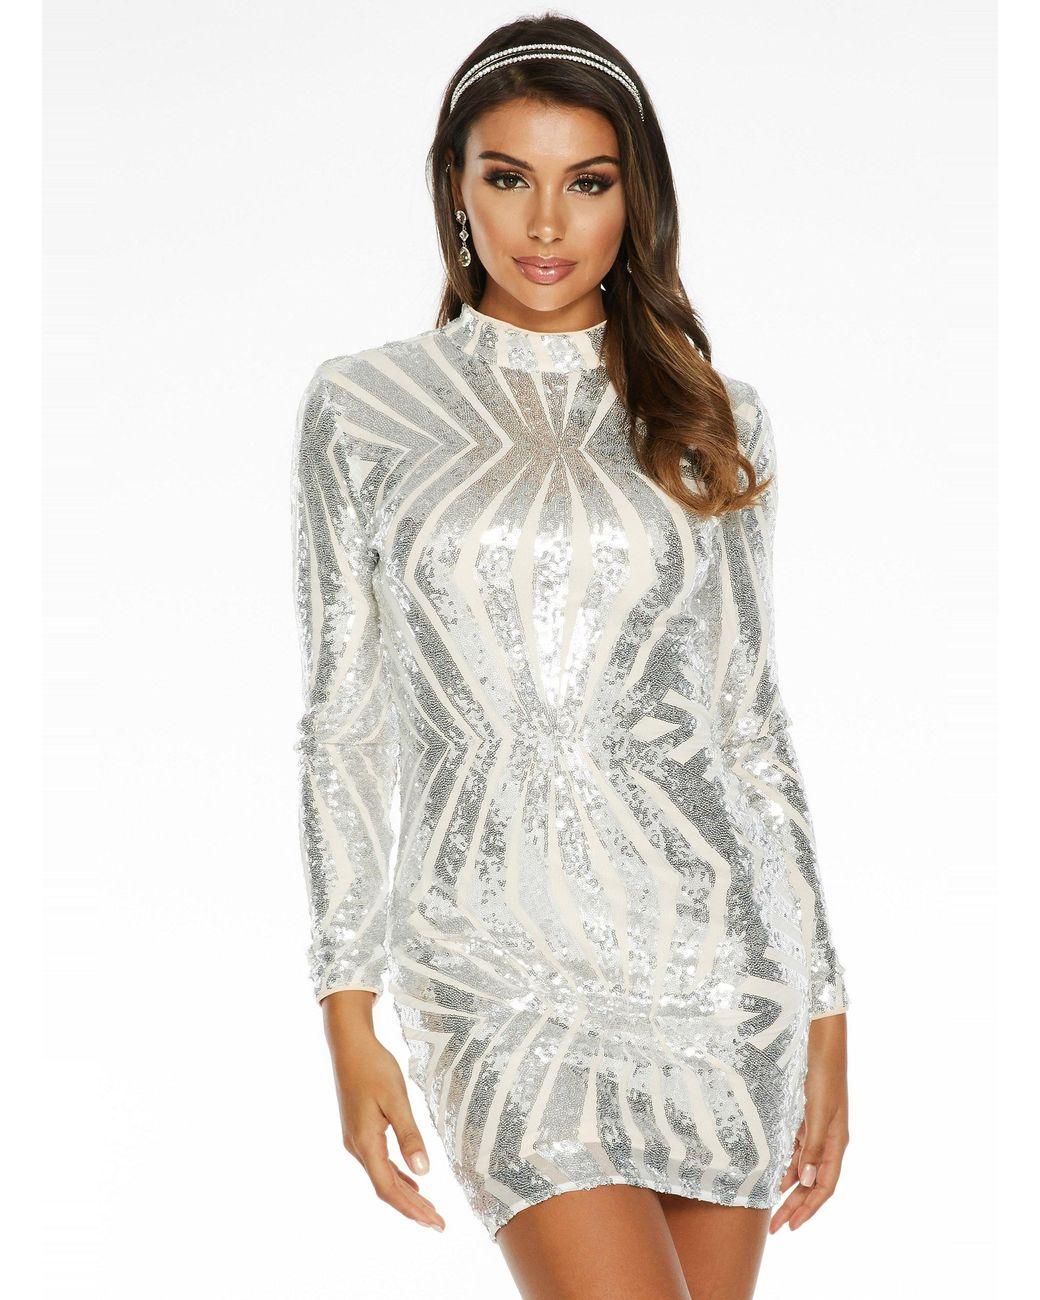 silver sequin dress quiz